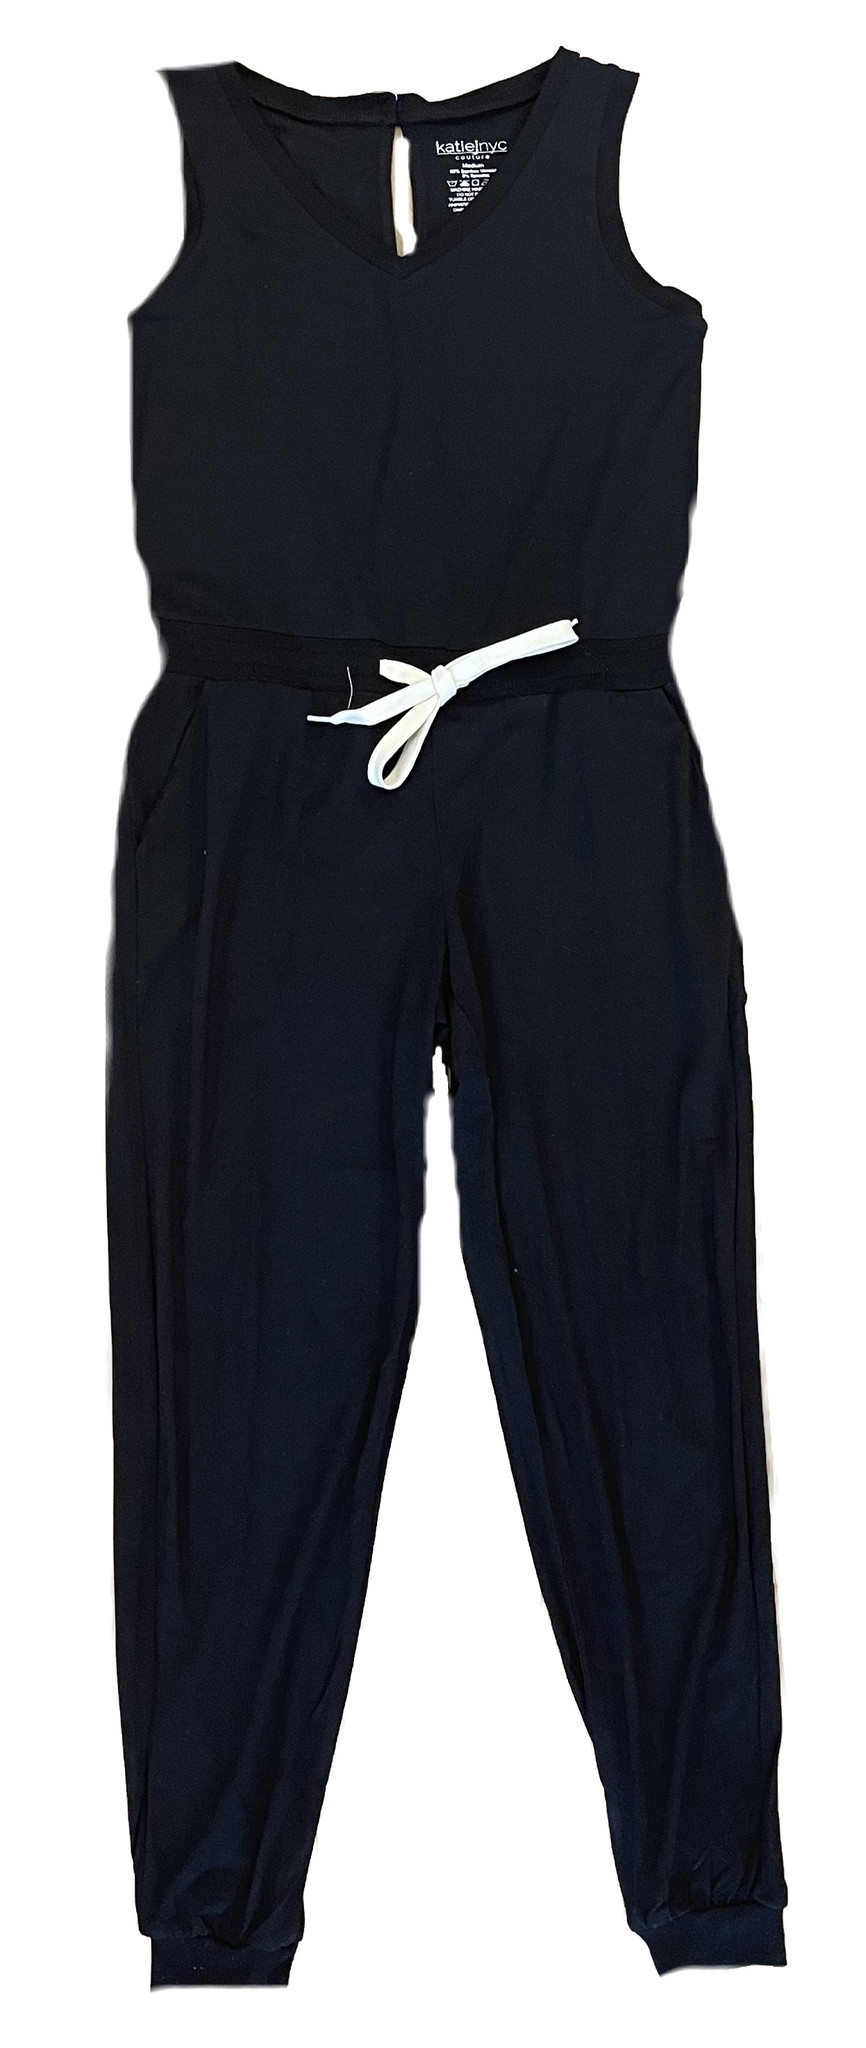 Katie J NYC Black Jumpsuit